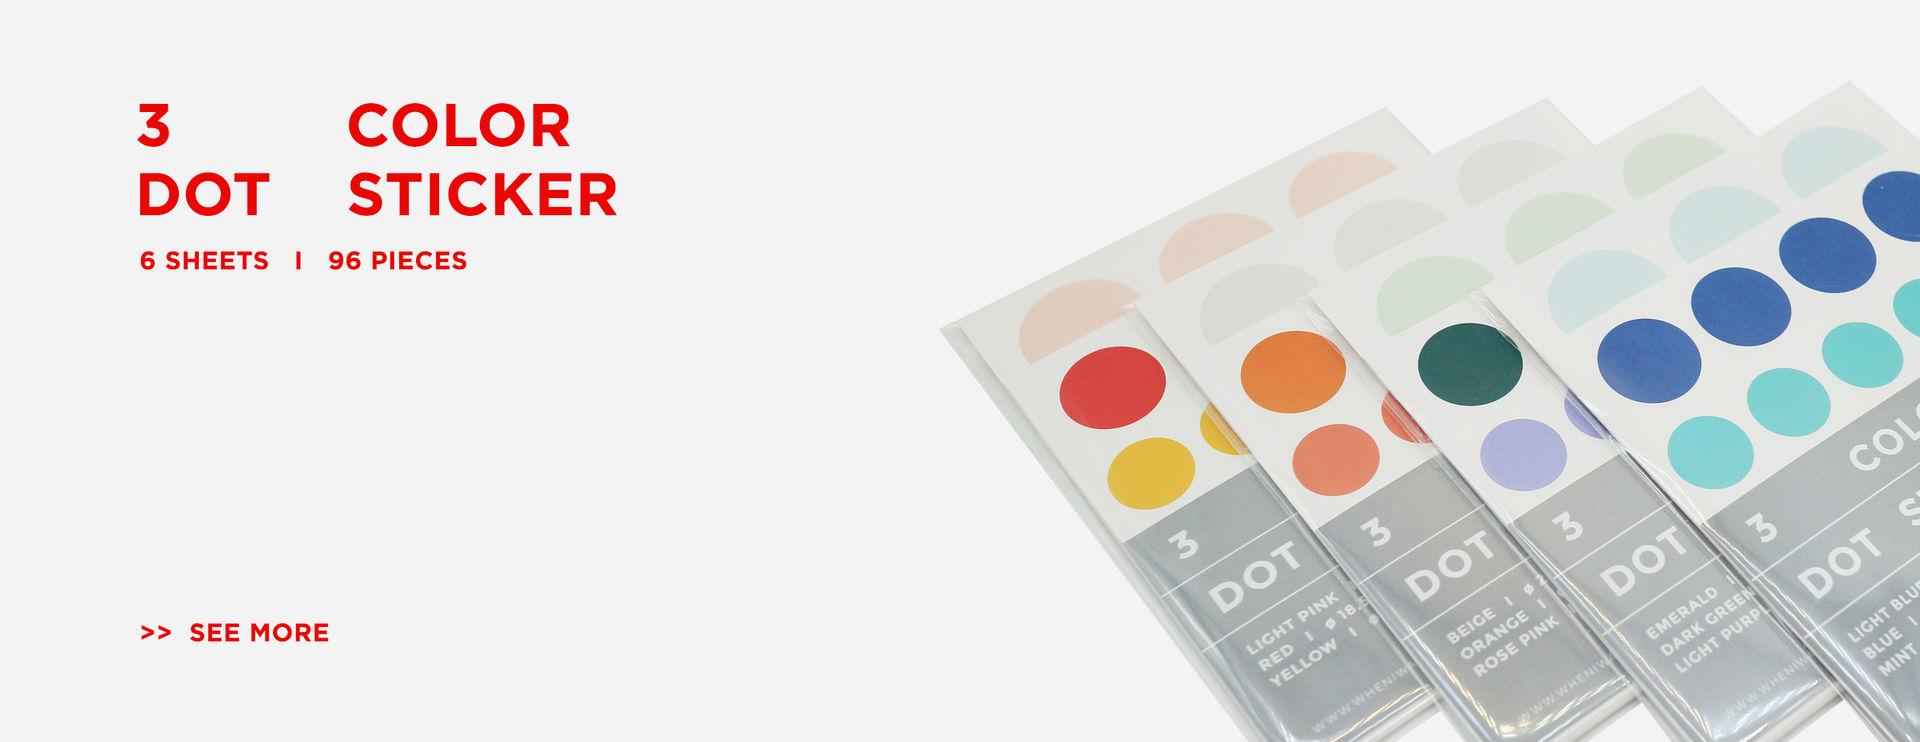 3 Color Dot Sticker